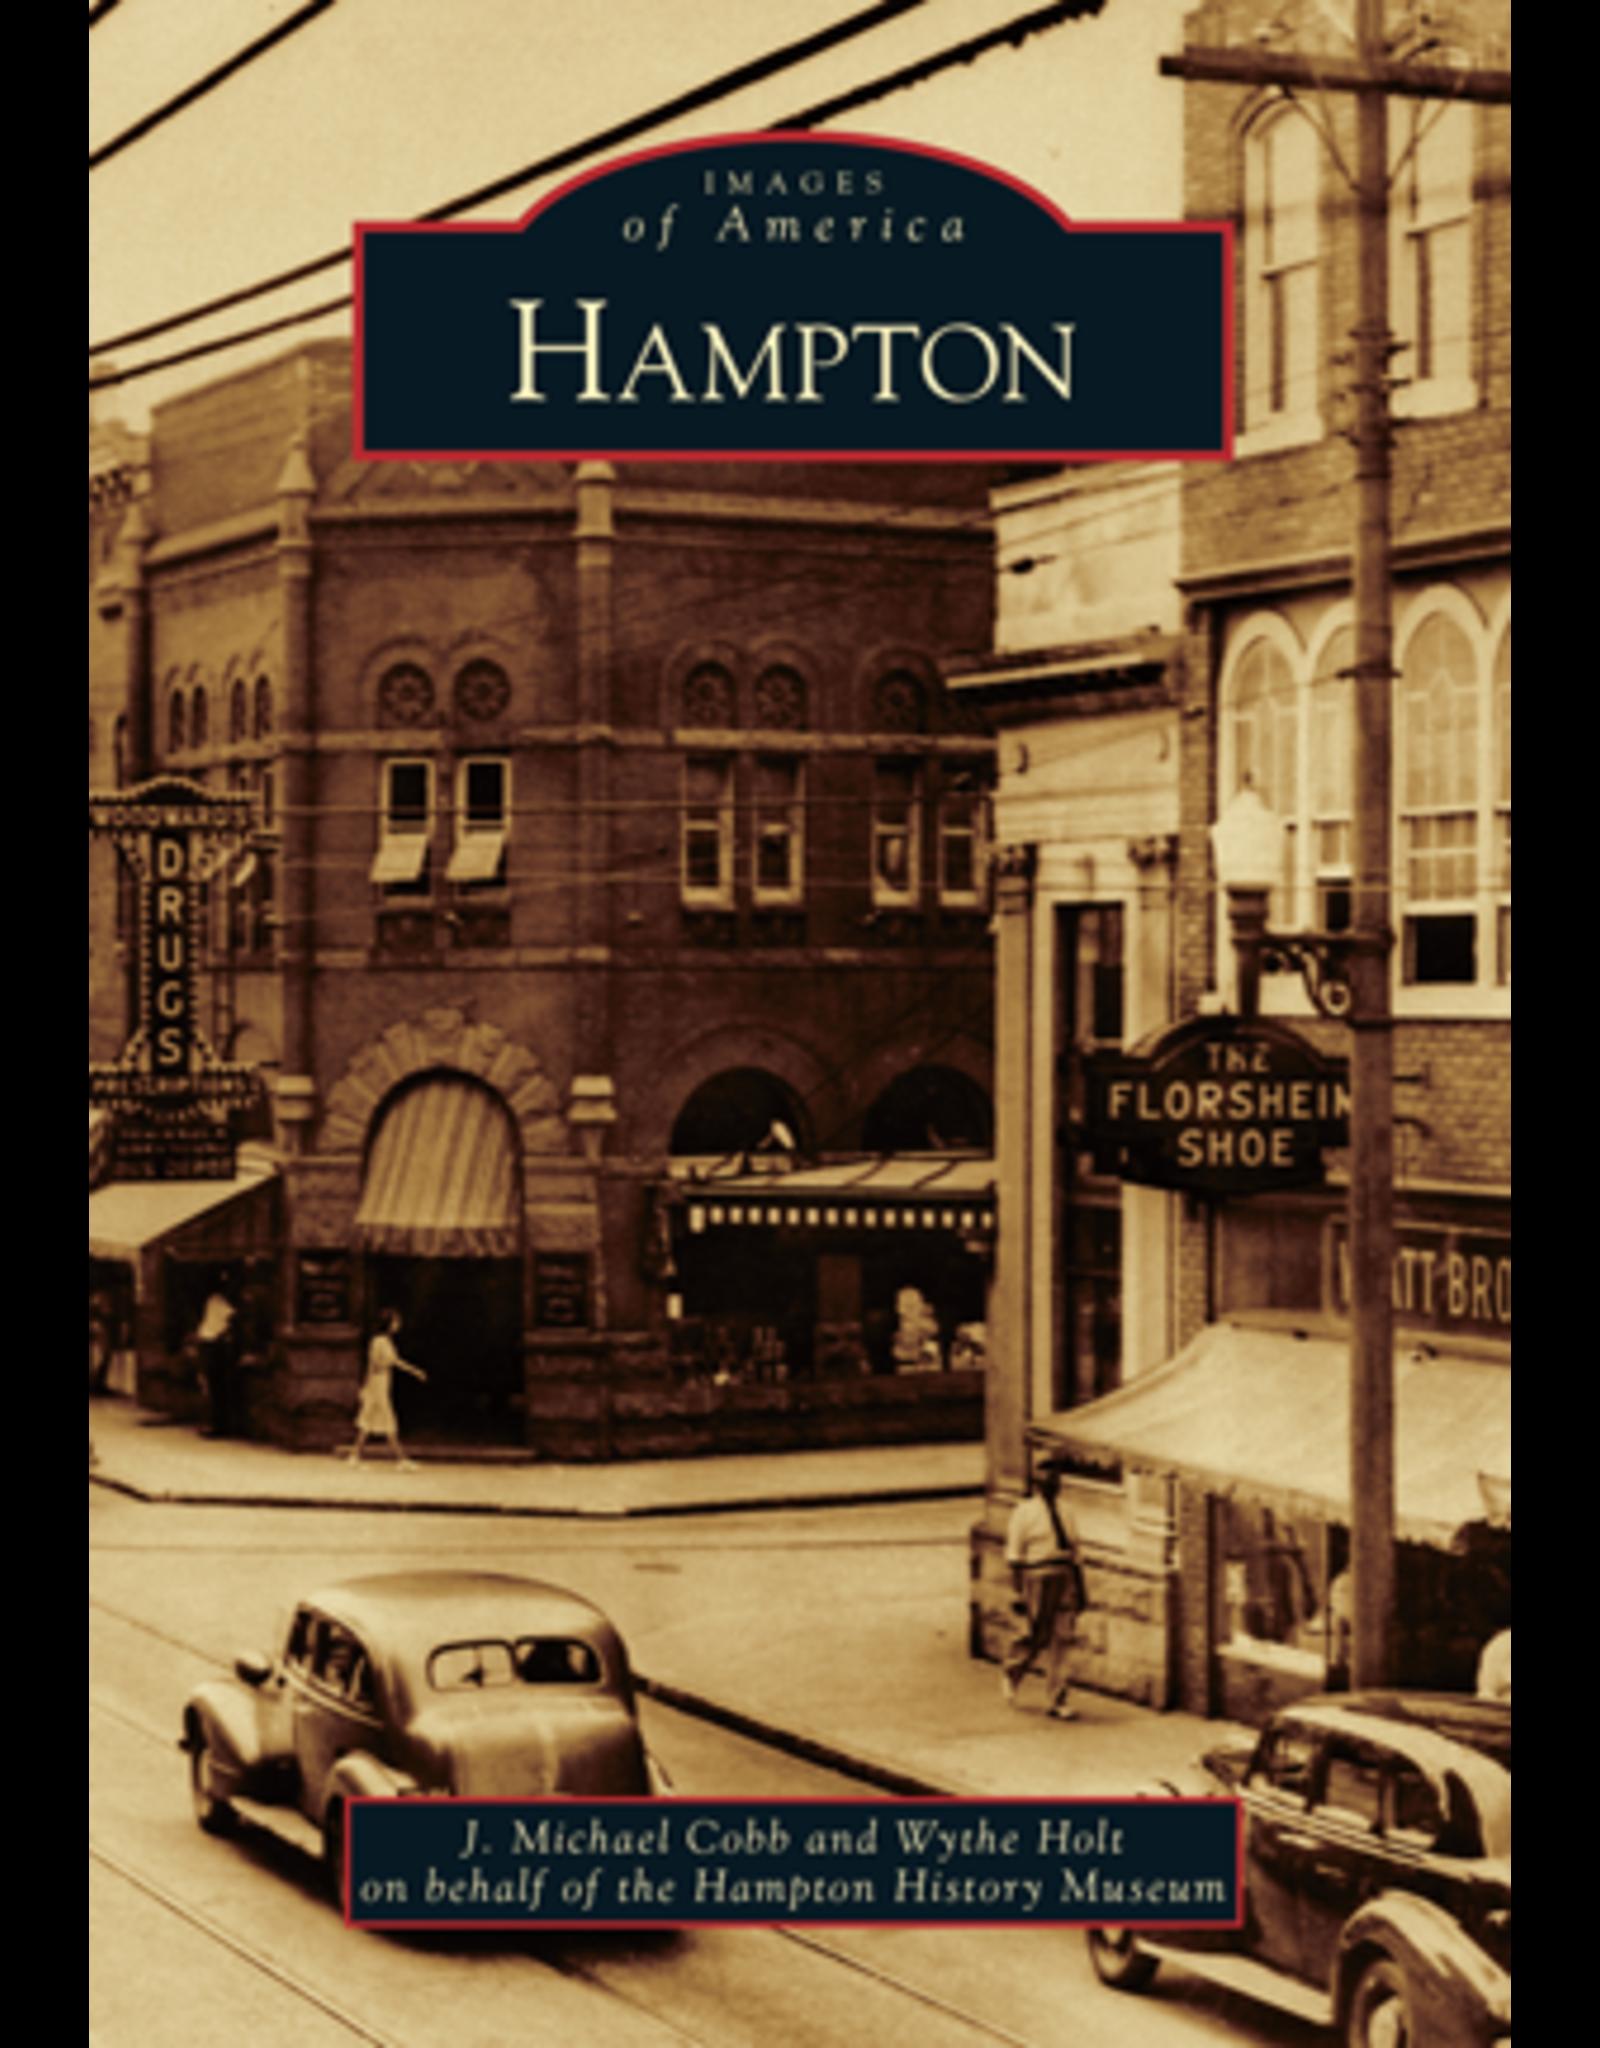 Images of America - Hampton